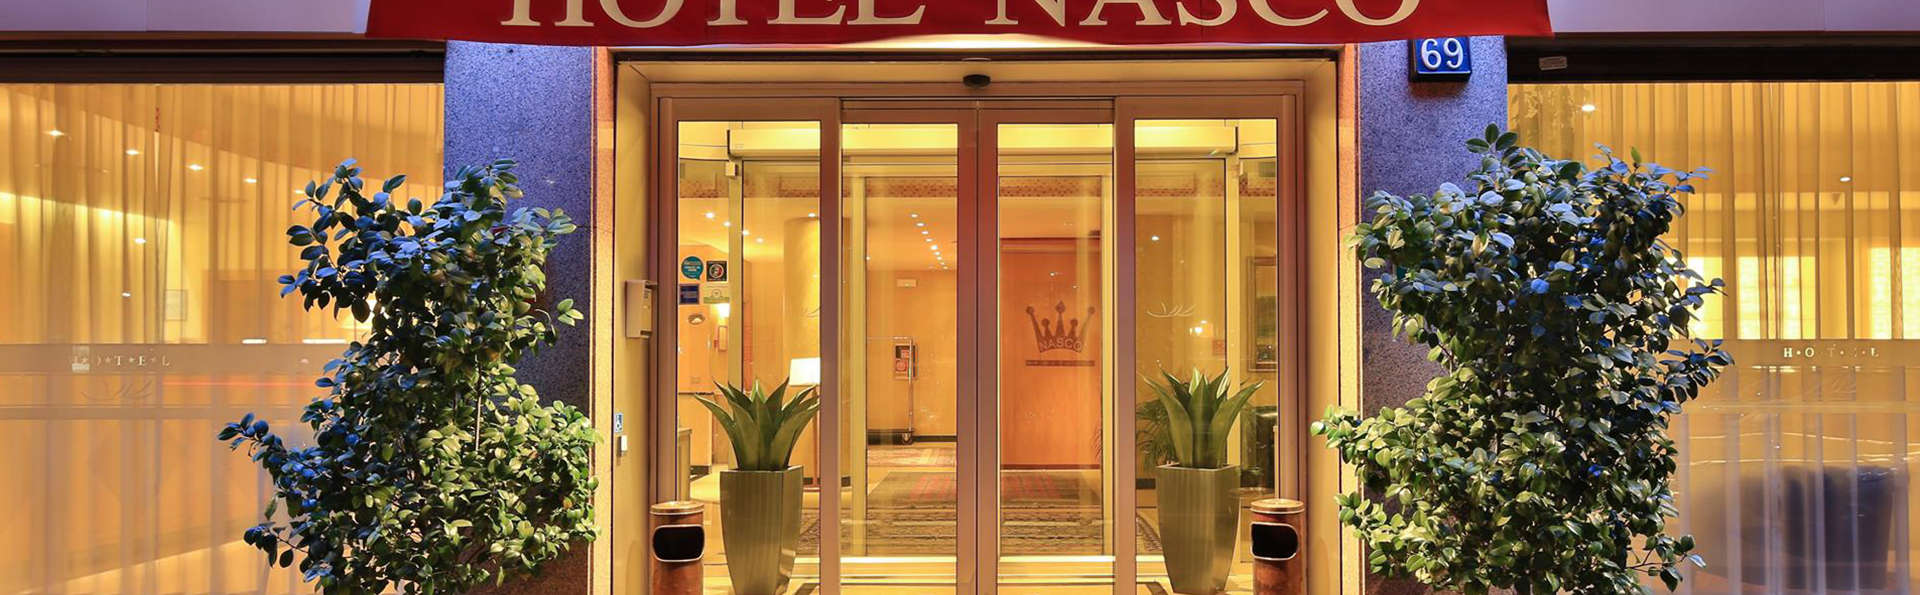 The Originals City, Hôtel Nasco, Milan (Qualys-Hotel) - EDIT_entrance.jpg